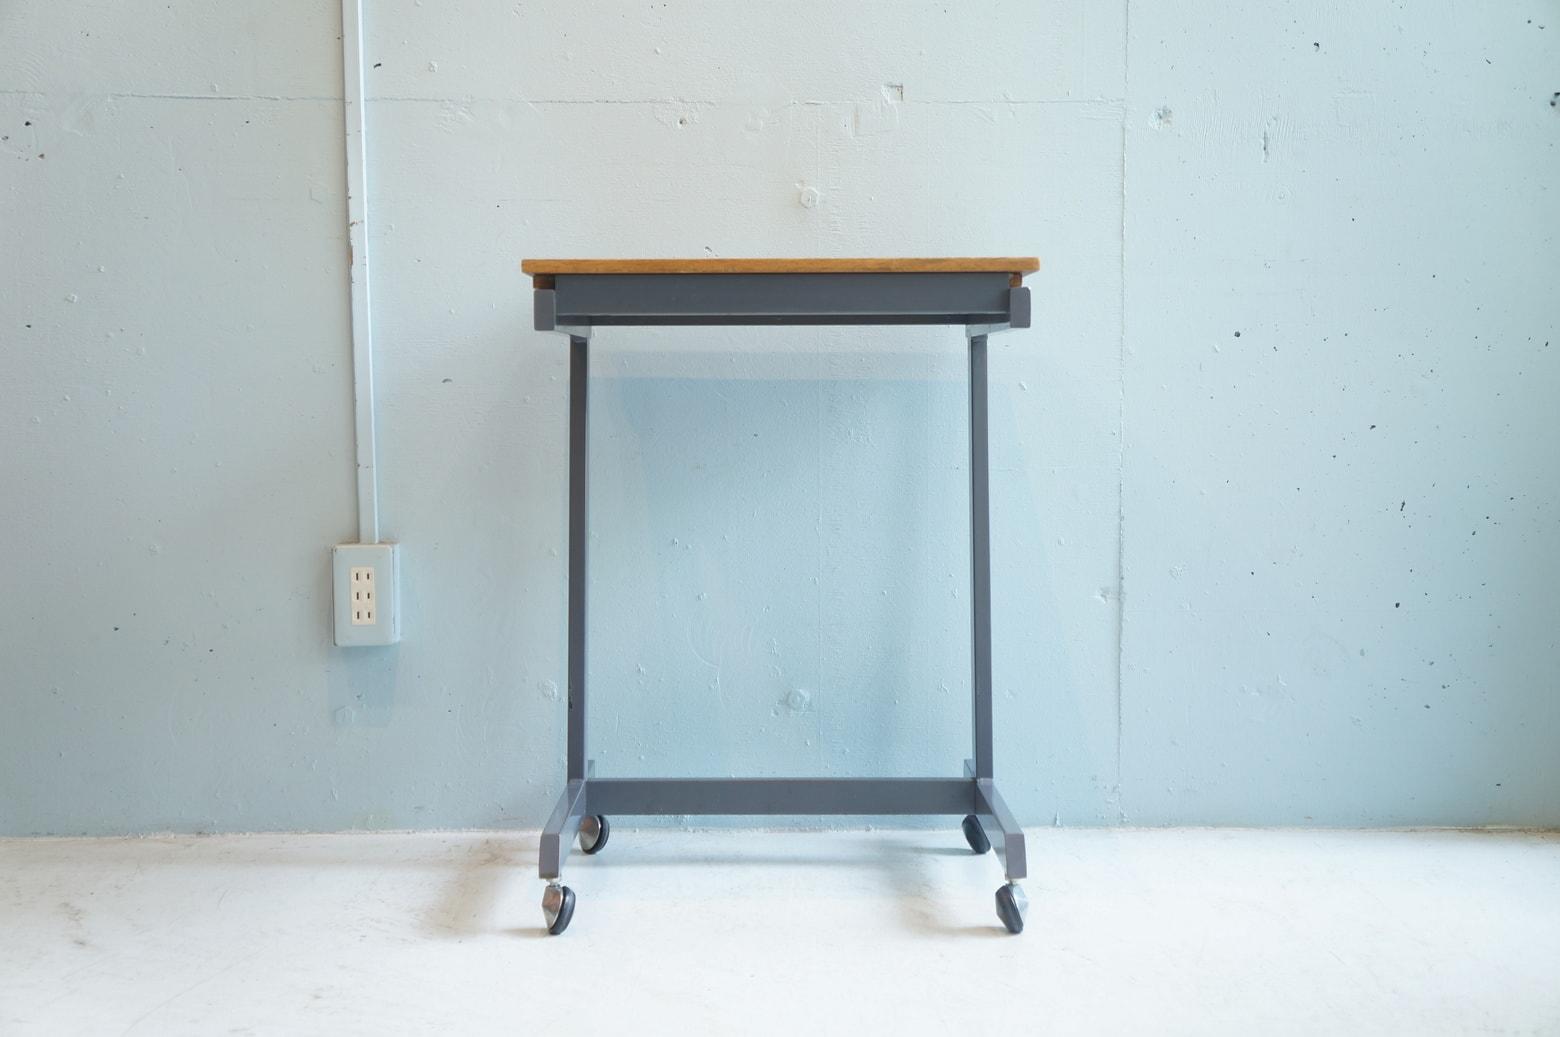 Danish Vintage Trolley Side Table/デンマーク ヴィンテージ トロリーサイドテーブル